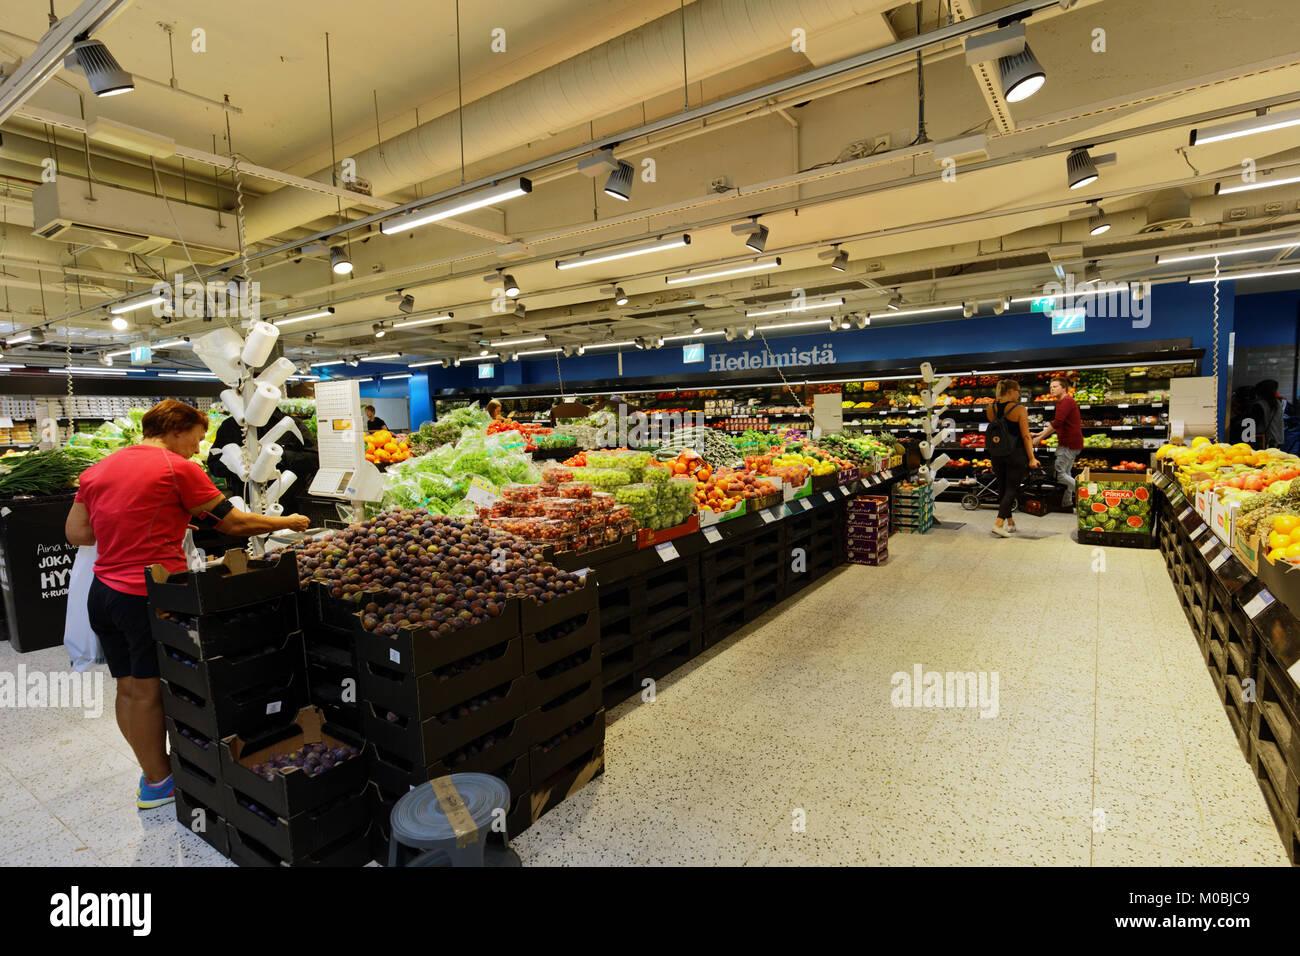 Finnish Supermarket Stock Photos & Finnish Supermarket Stock Images - Alamy